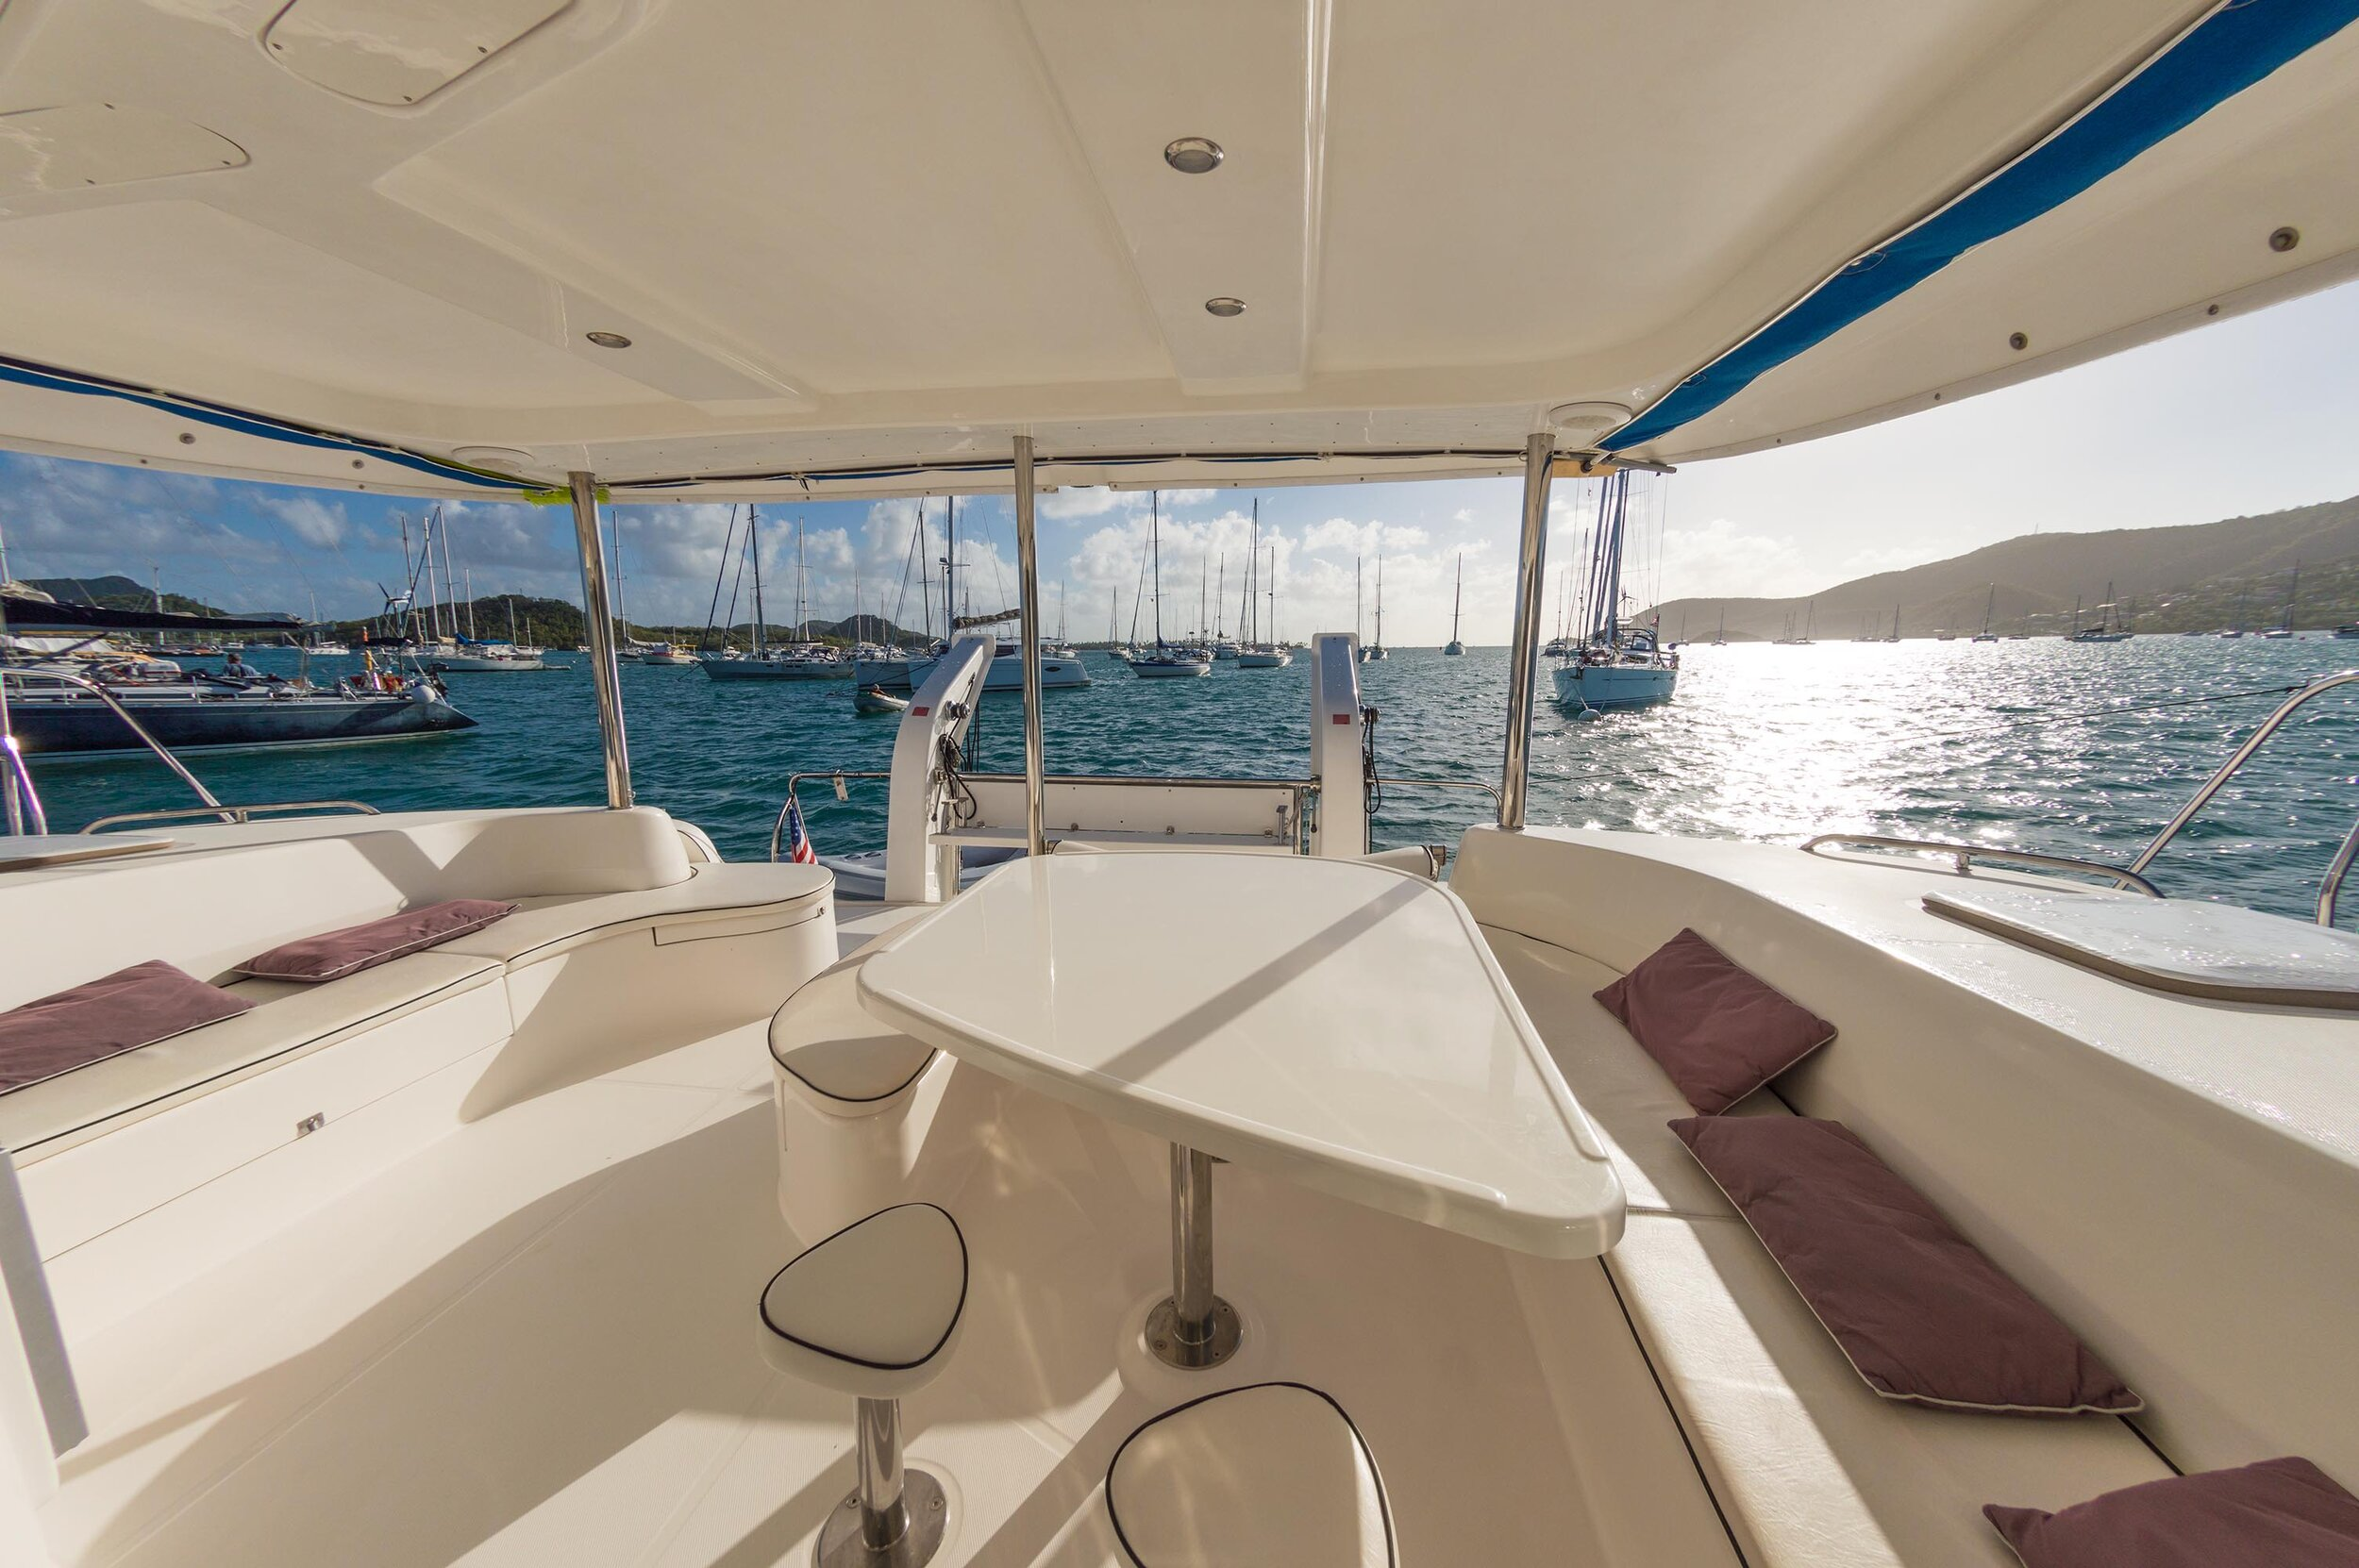 4_Leo46_CKC-8''Caribbean kite cruise catamaran big aft deck'.jpg